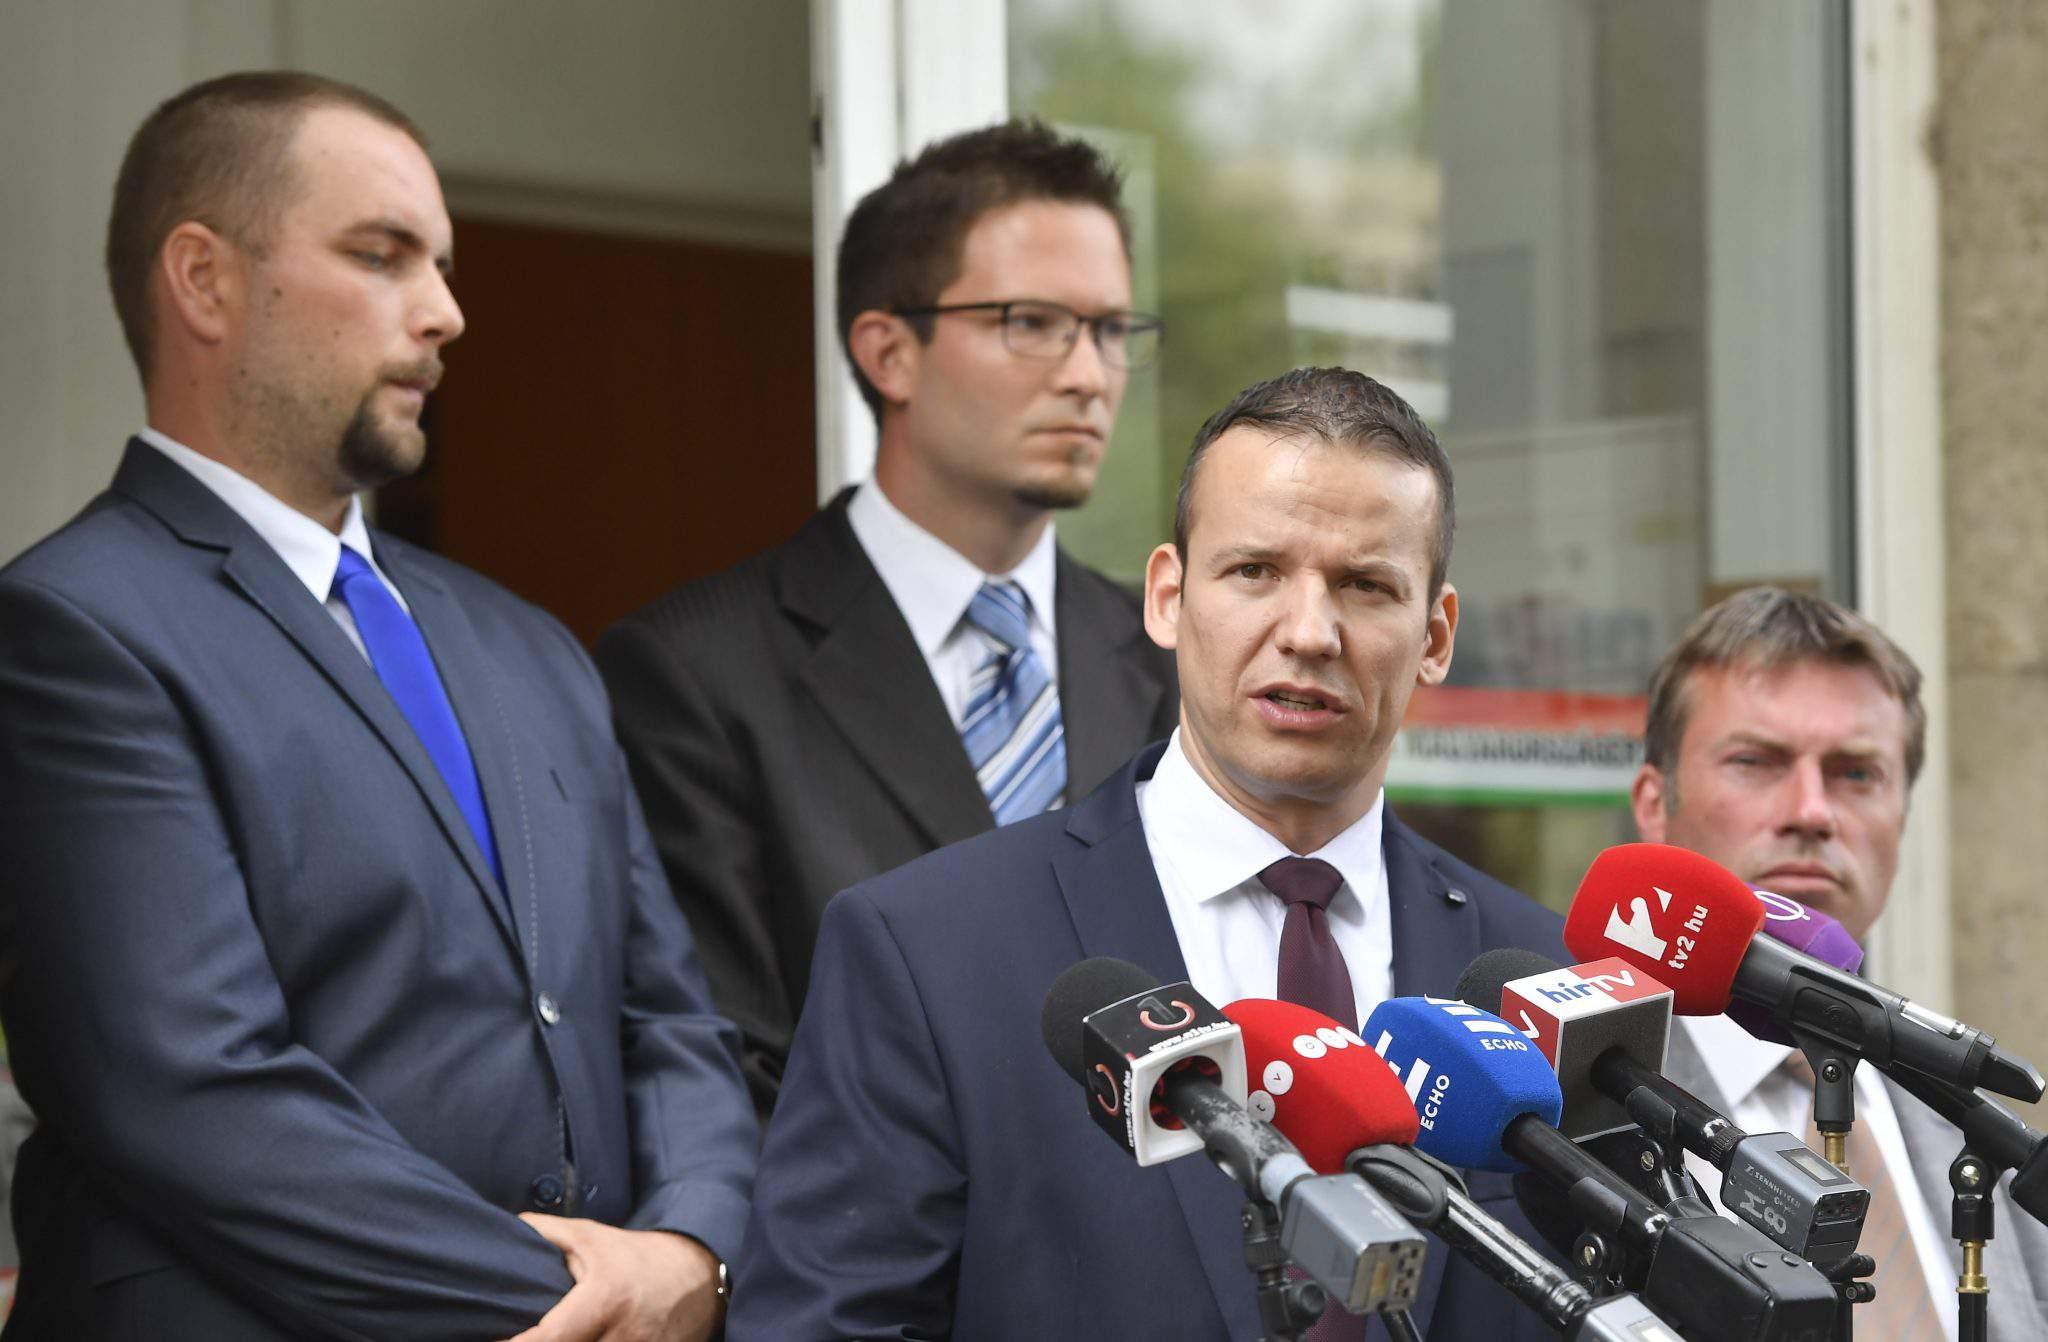 Jobbik party Toroczkai